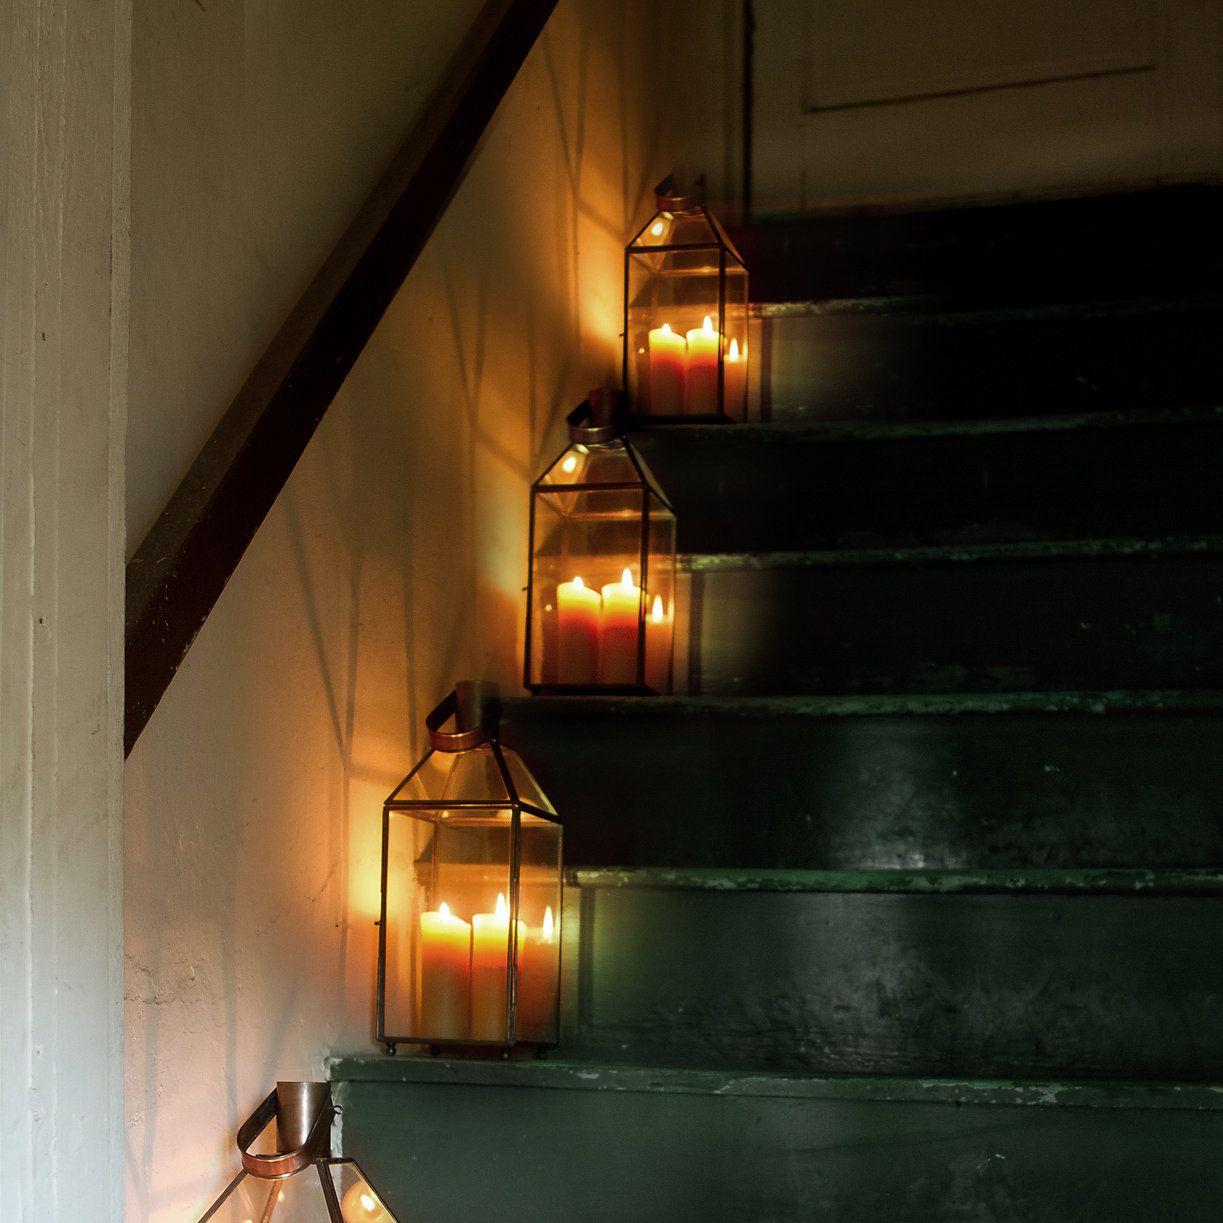 Copper & Glass Lanterns | Making a Home | Pinterest | Outdoor living ...